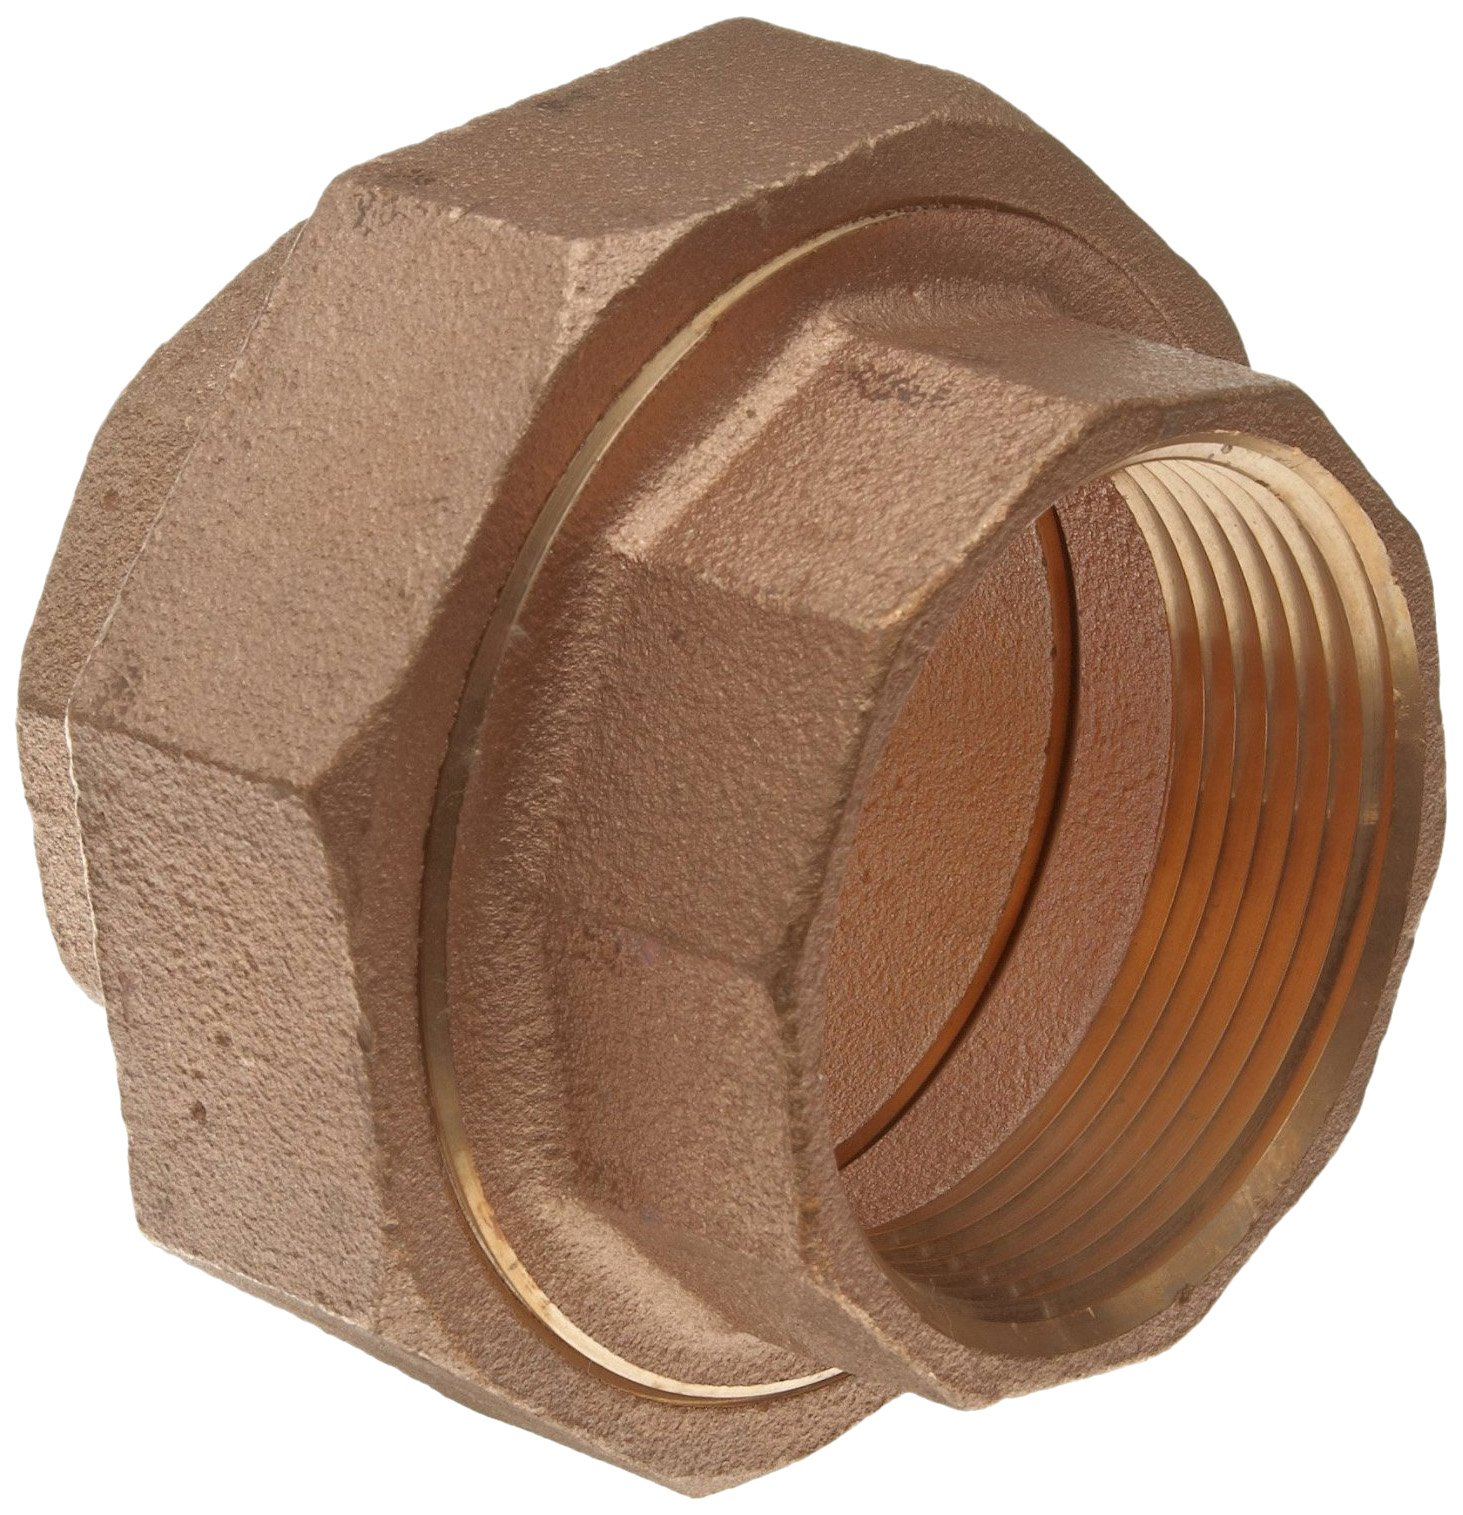 Brass Pipe Fitting, Class 250, Union, 2-1/2'' x 2-1/2'' NPT Female